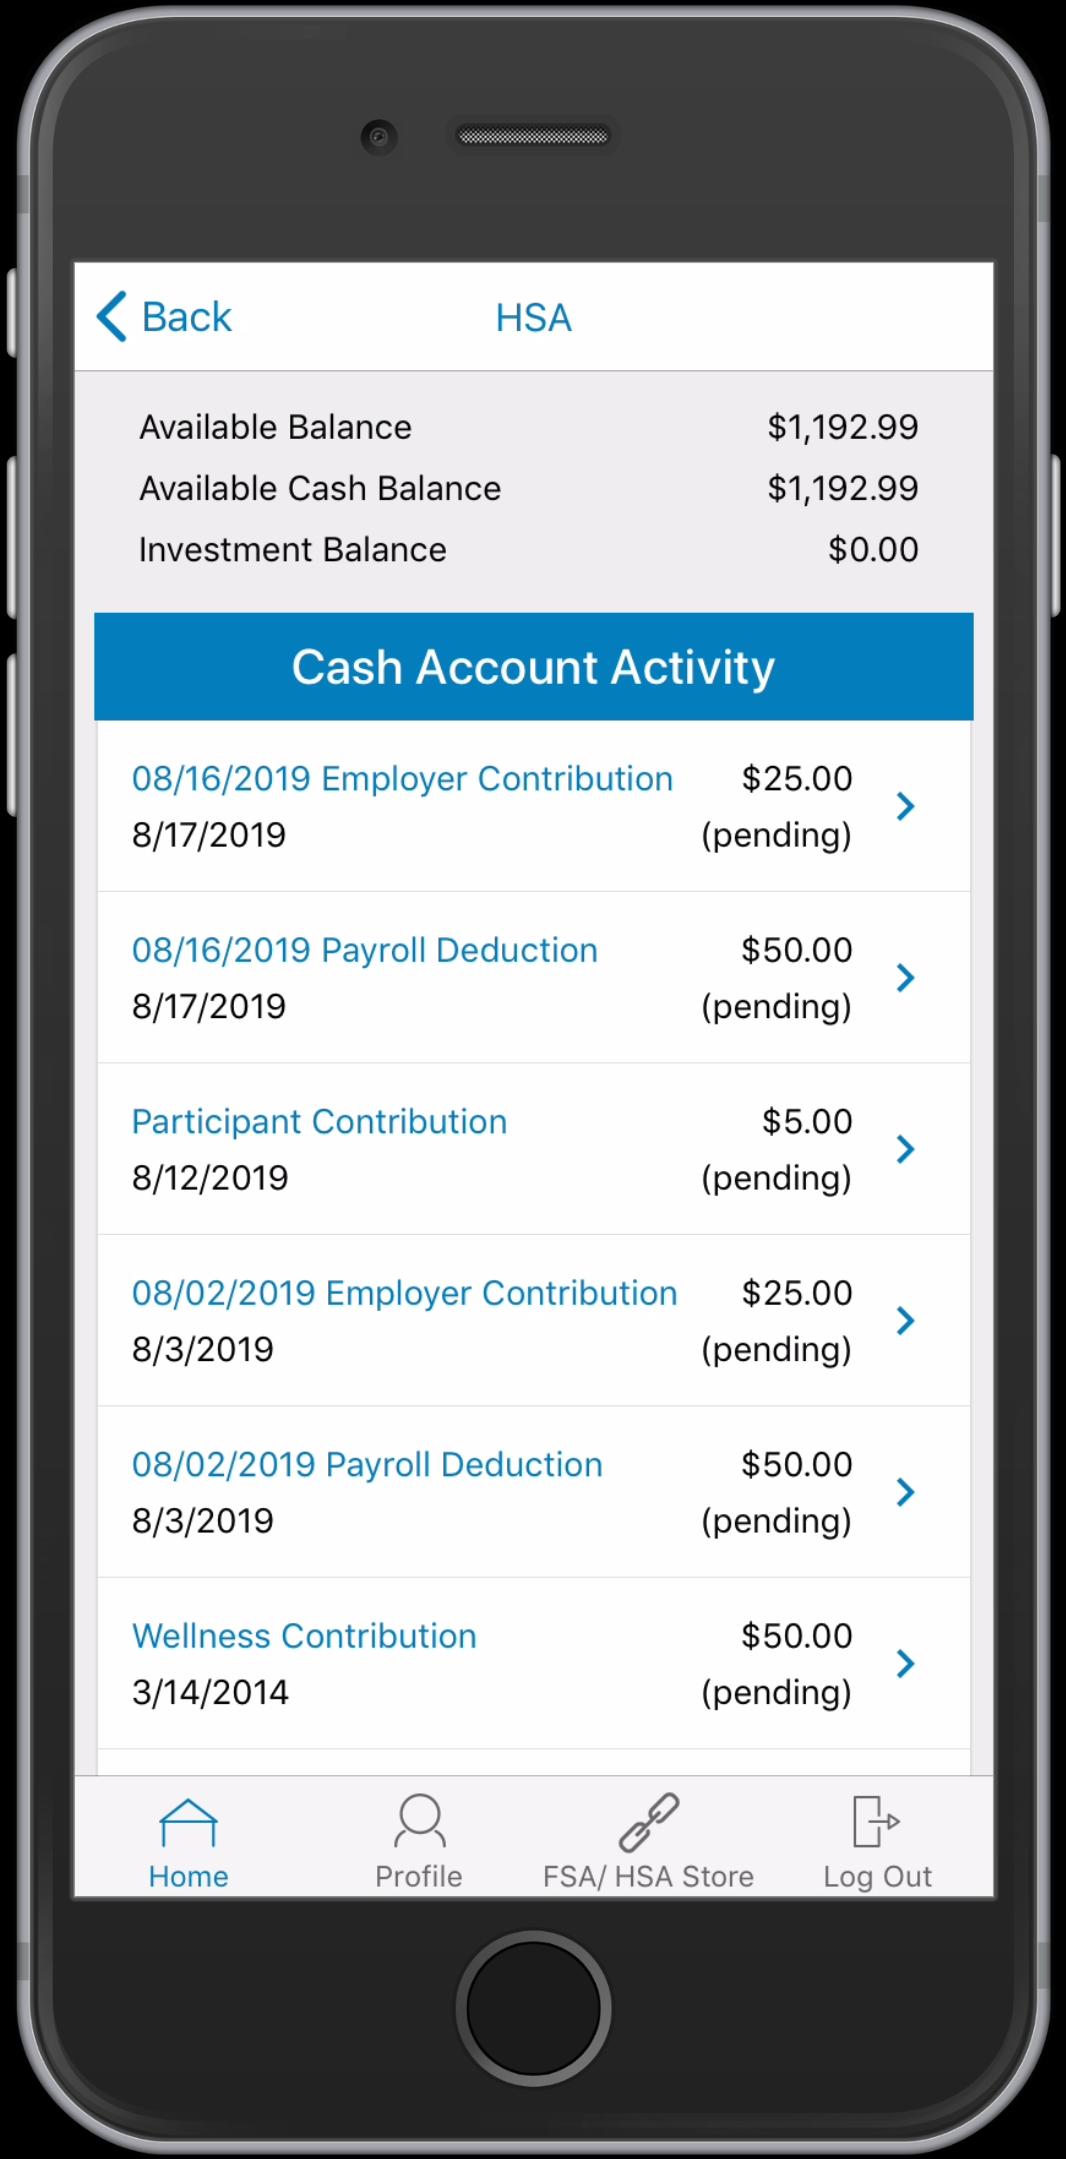 WEX Health Cloud Mobile App_HSA Account Activity